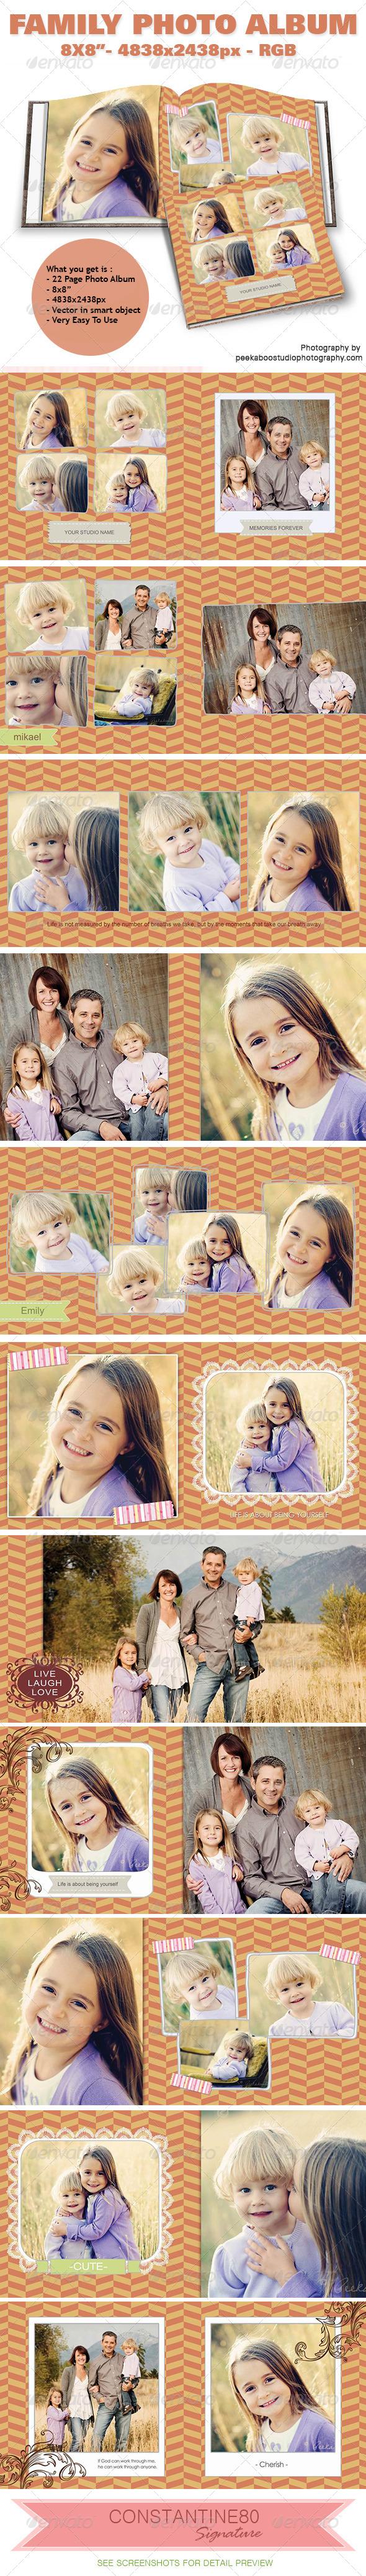 GraphicRiver Family Photo Album 4899120